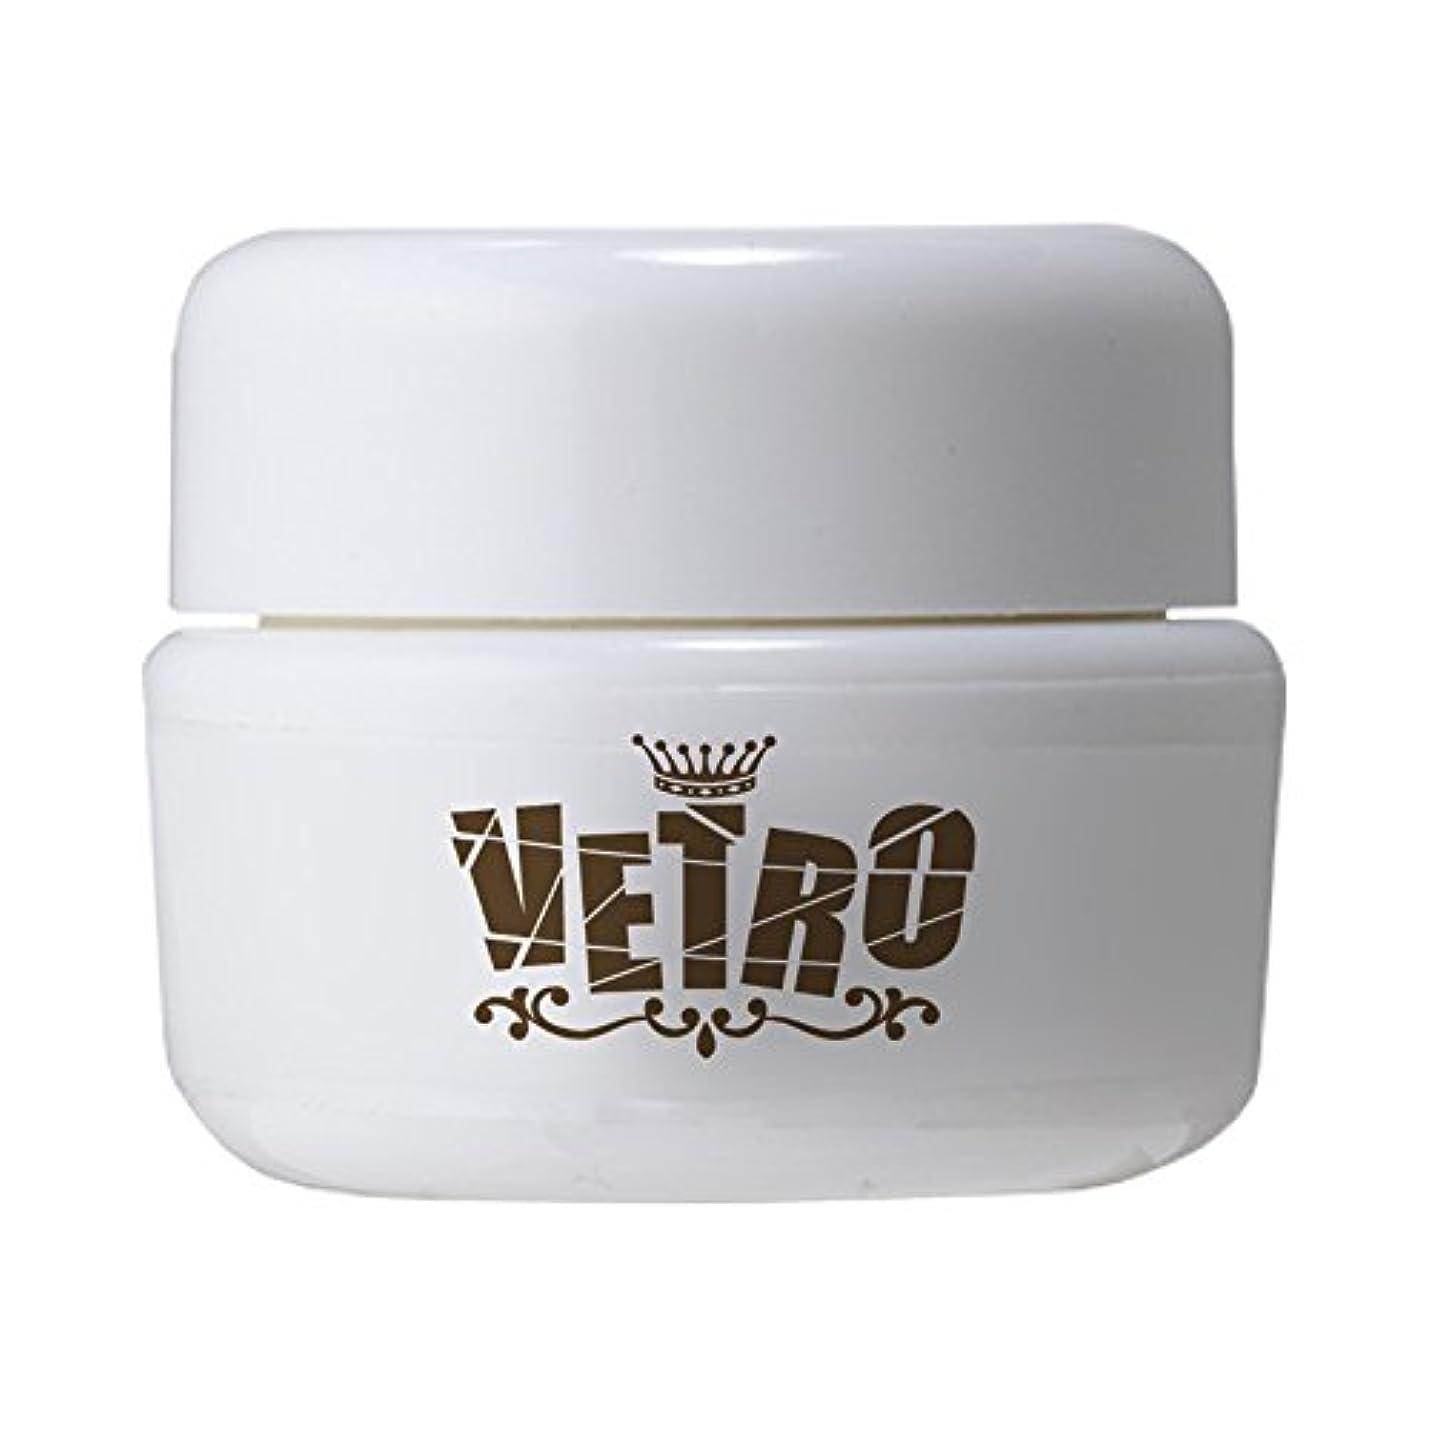 VETRO No.19 カラージェル グリッター VL273 ロリポップリーフ 4ml